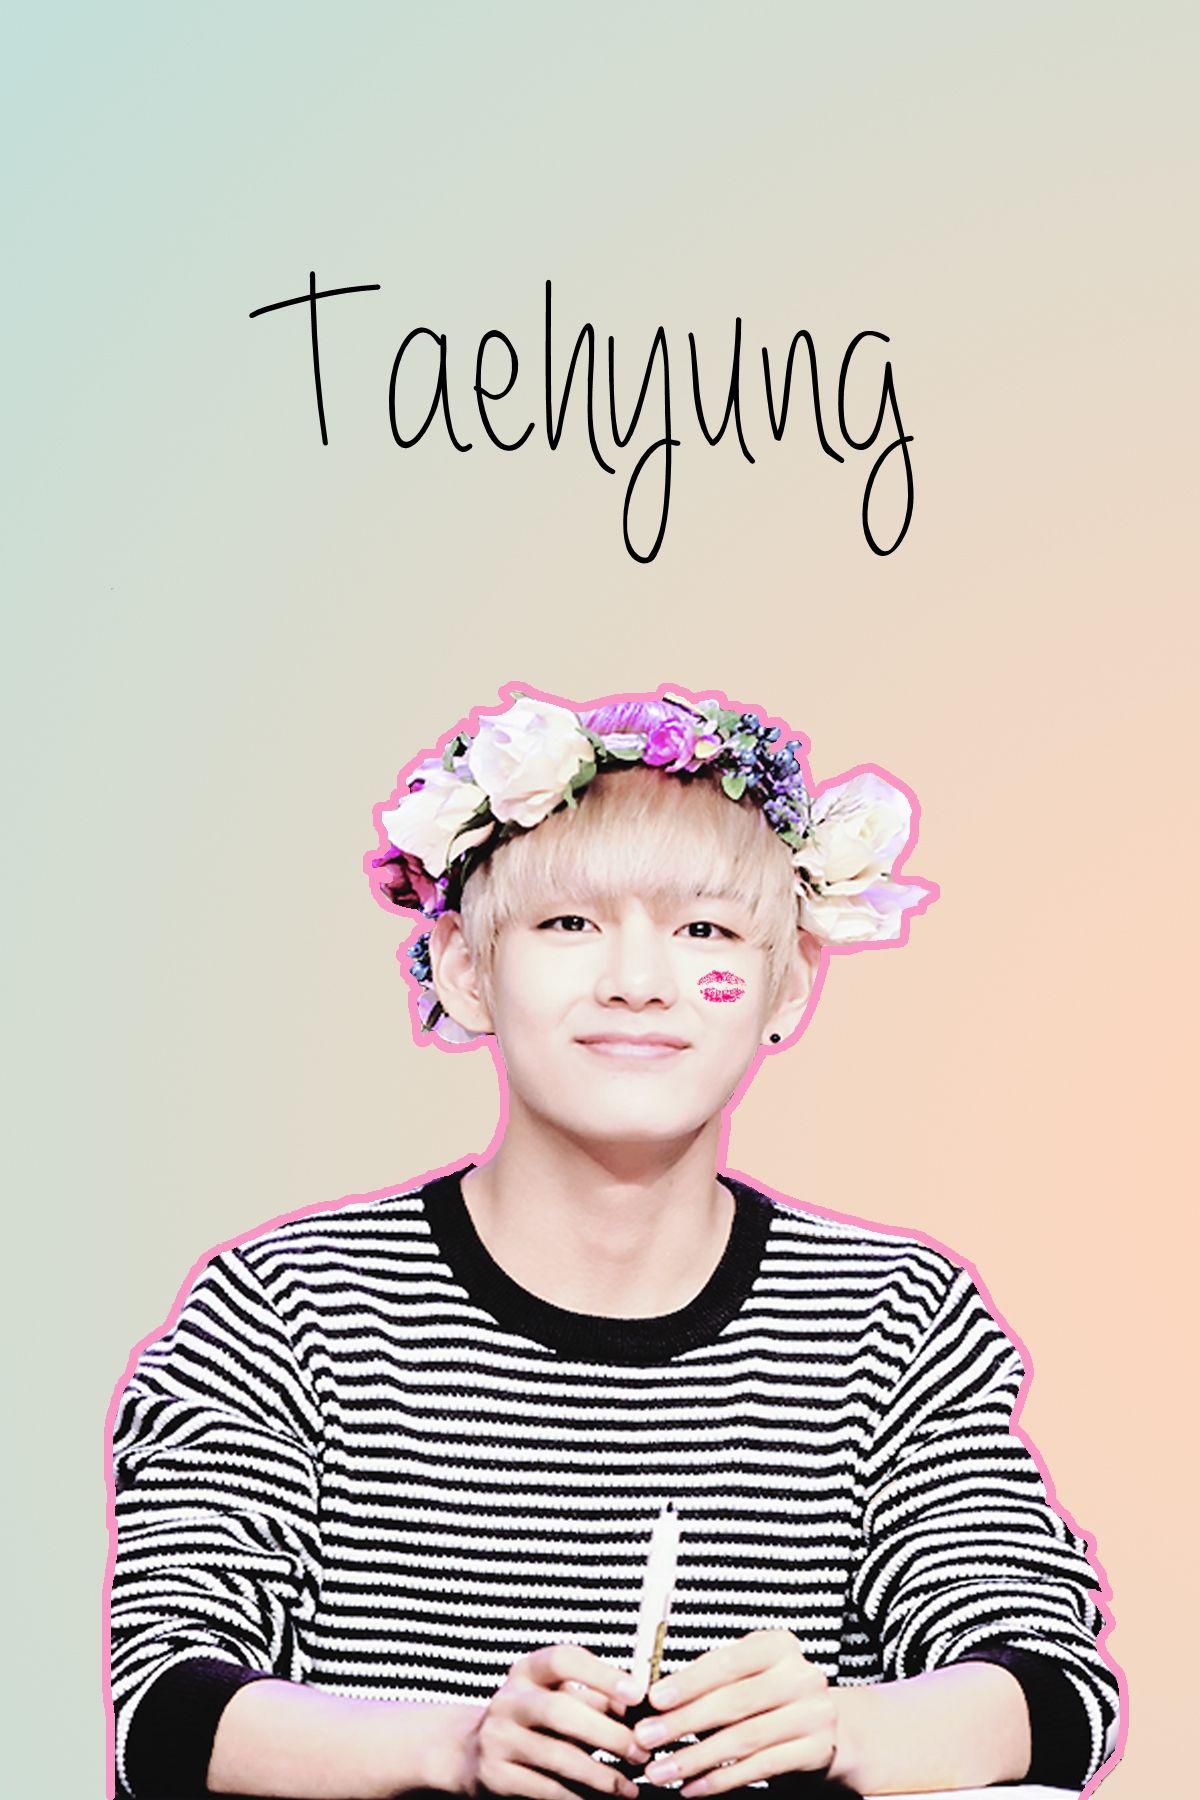 Download Wallpaper V Taehyung BTS BTS Pinterest BTS [1200x1800 1200x1800